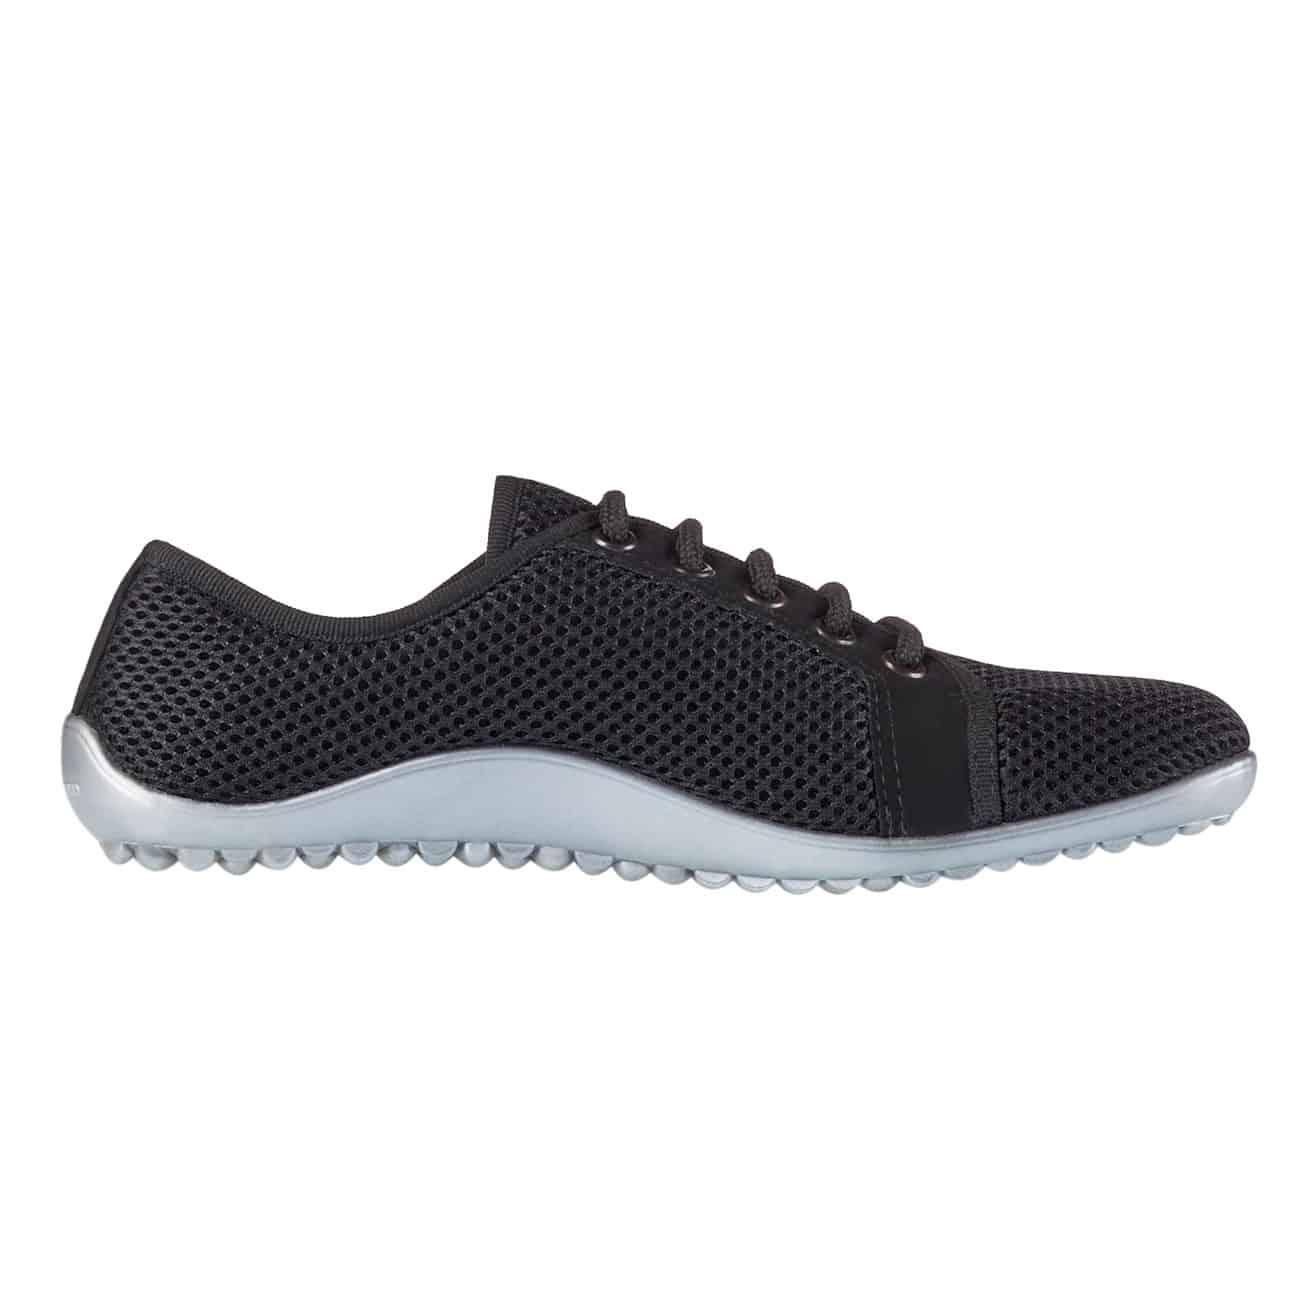 Leguano Black Active Barefoot Shoes